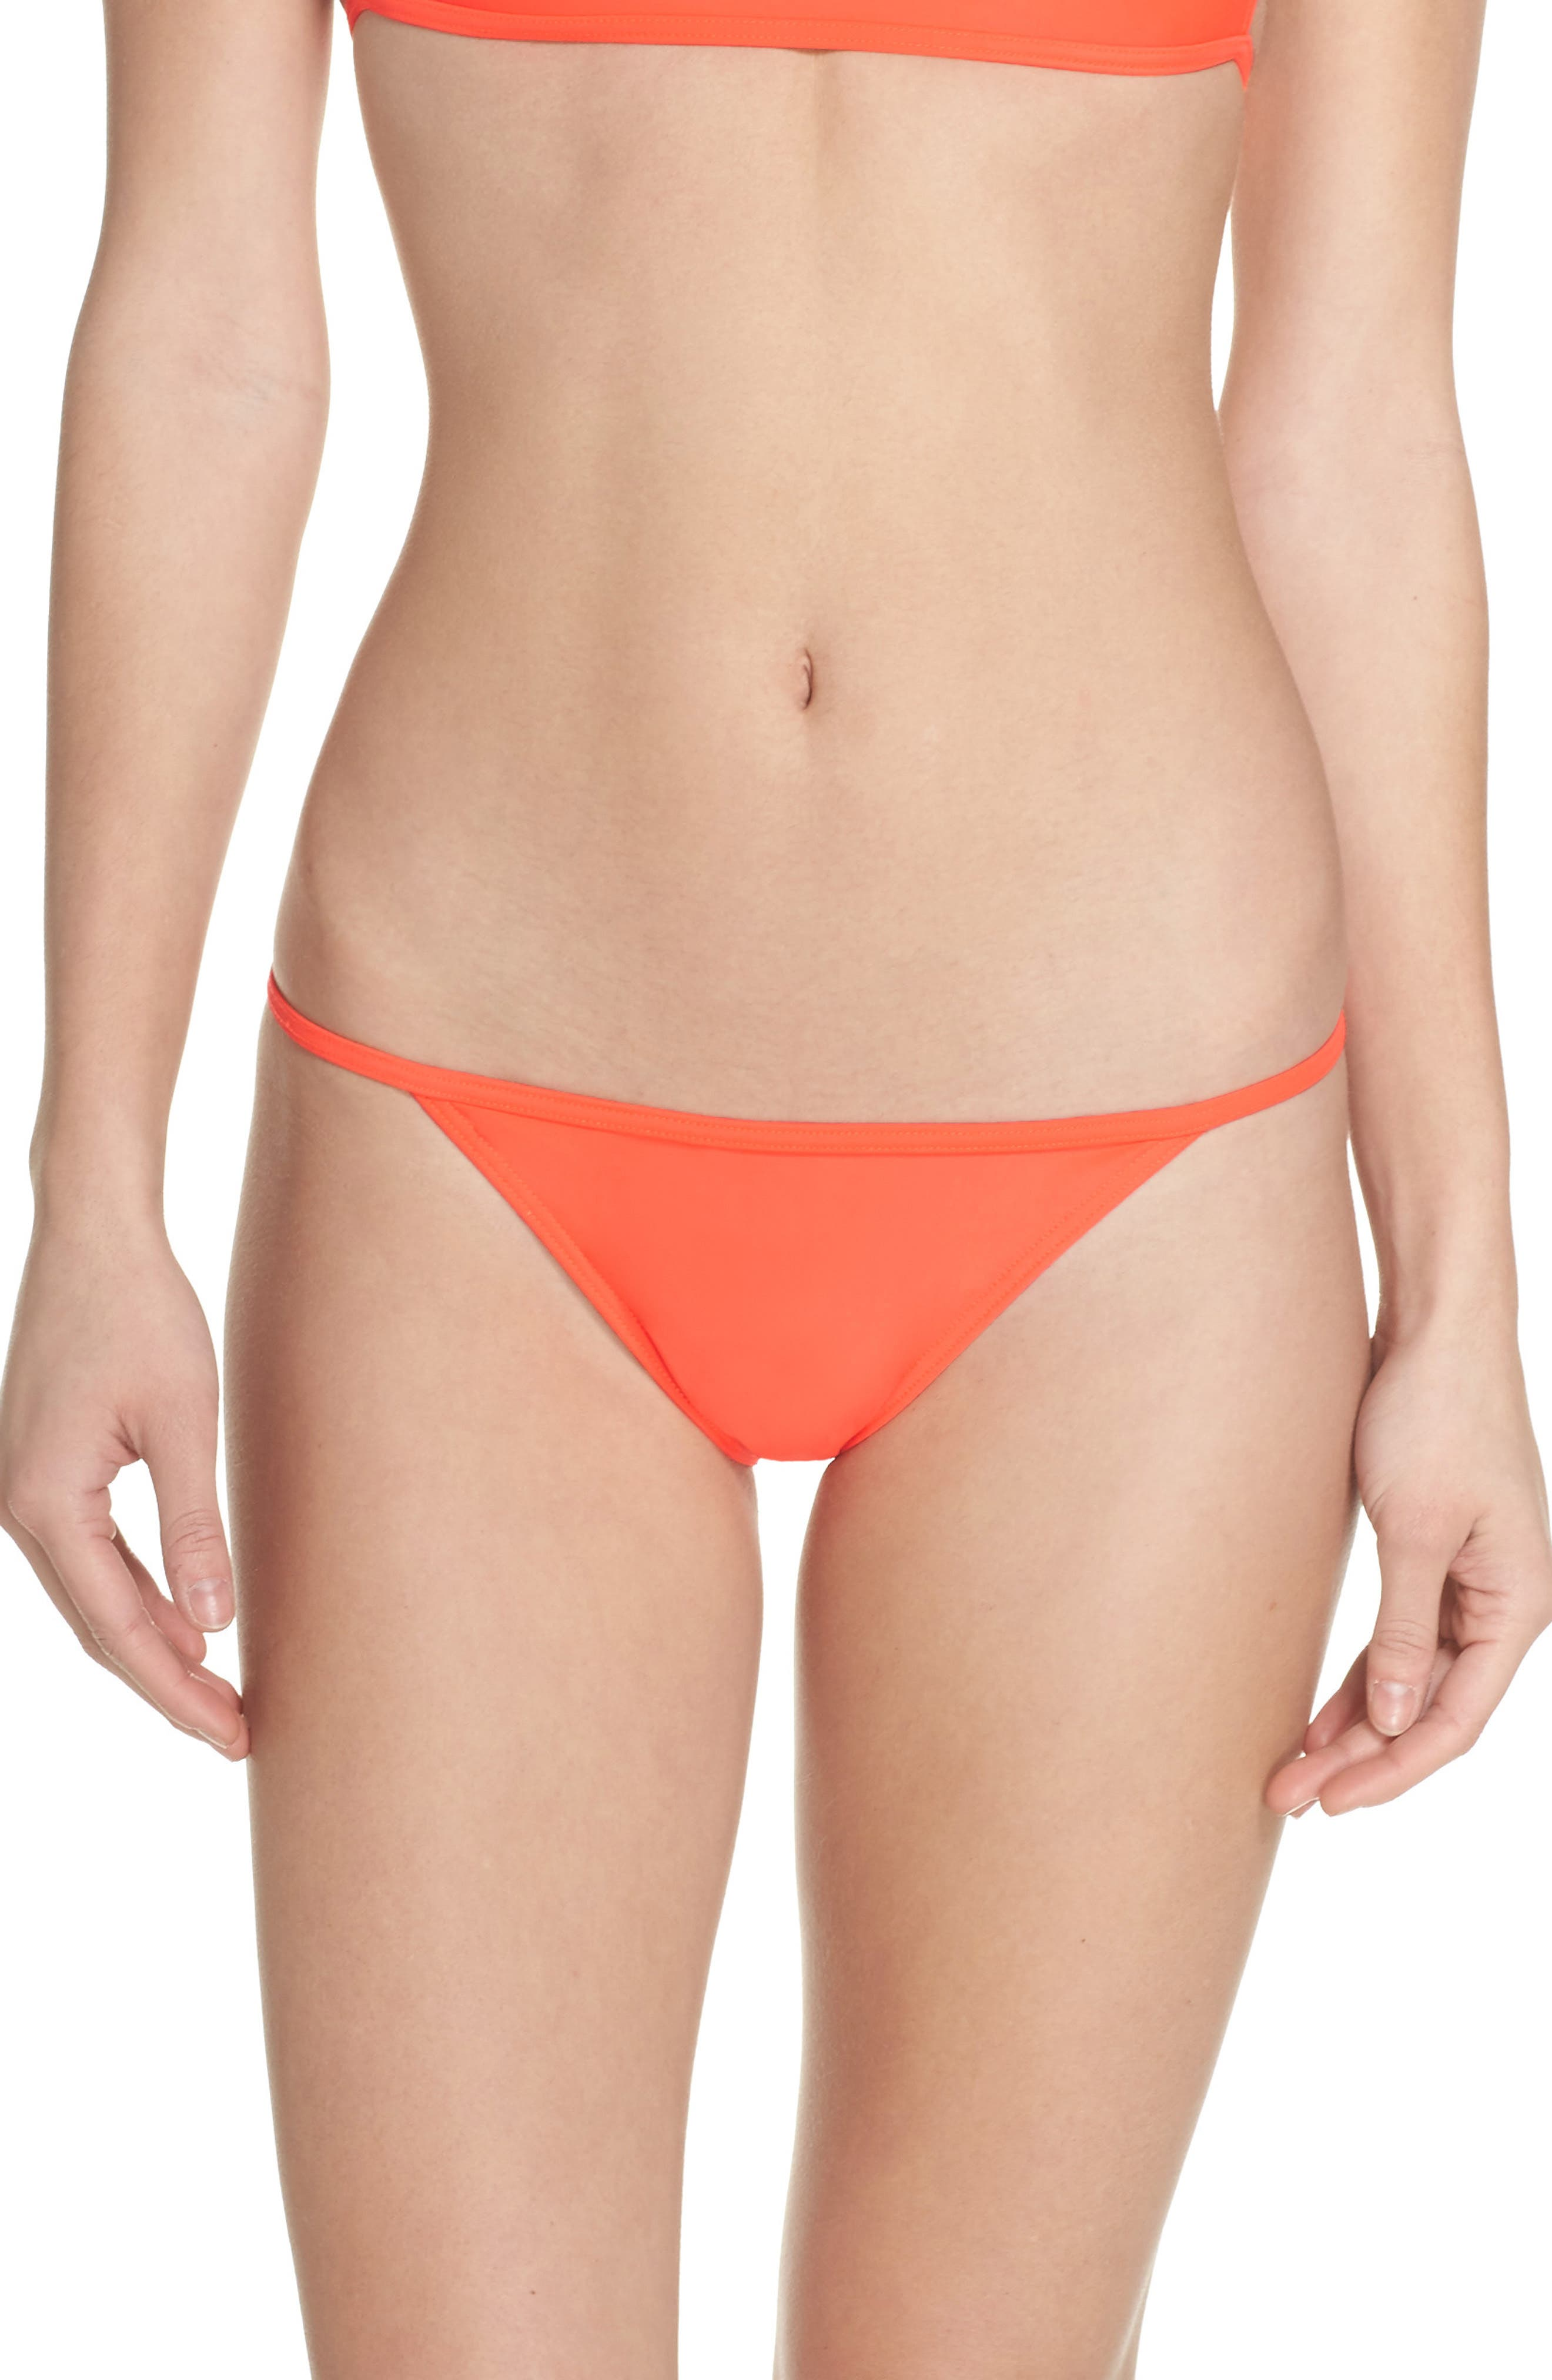 CHROMAT Cusp Bikini Bottoms, Main, color, 800